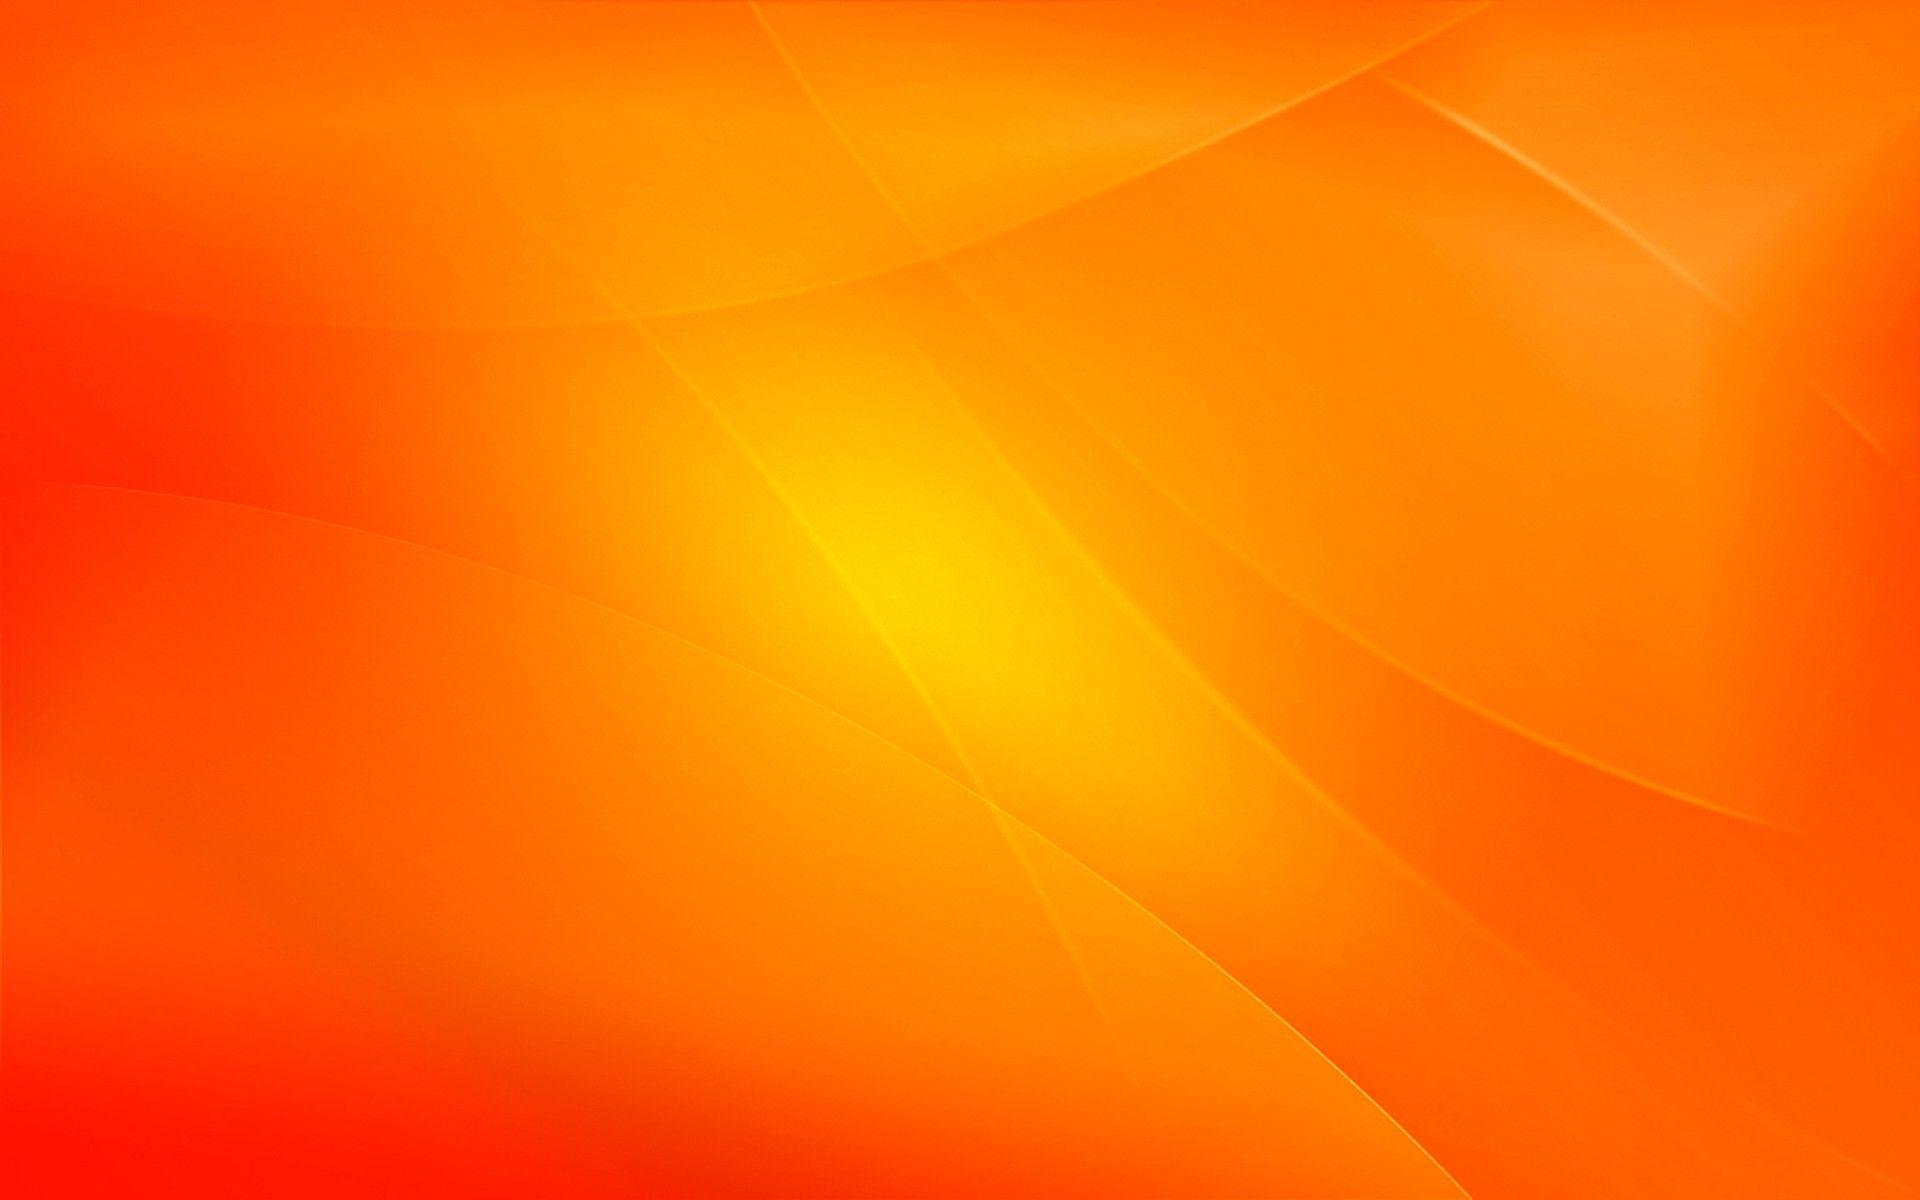 Orange wallpapers wallpaper cave for Orange wallpaper